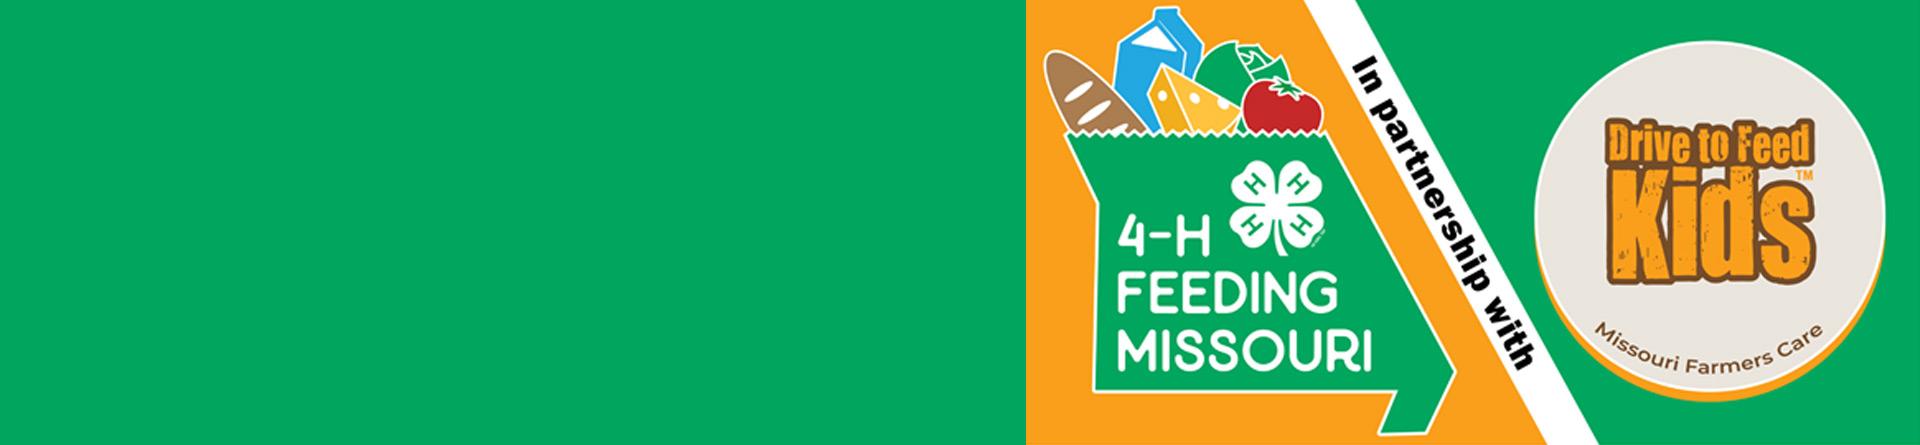 4-H banner for Feeding Missouri campaign